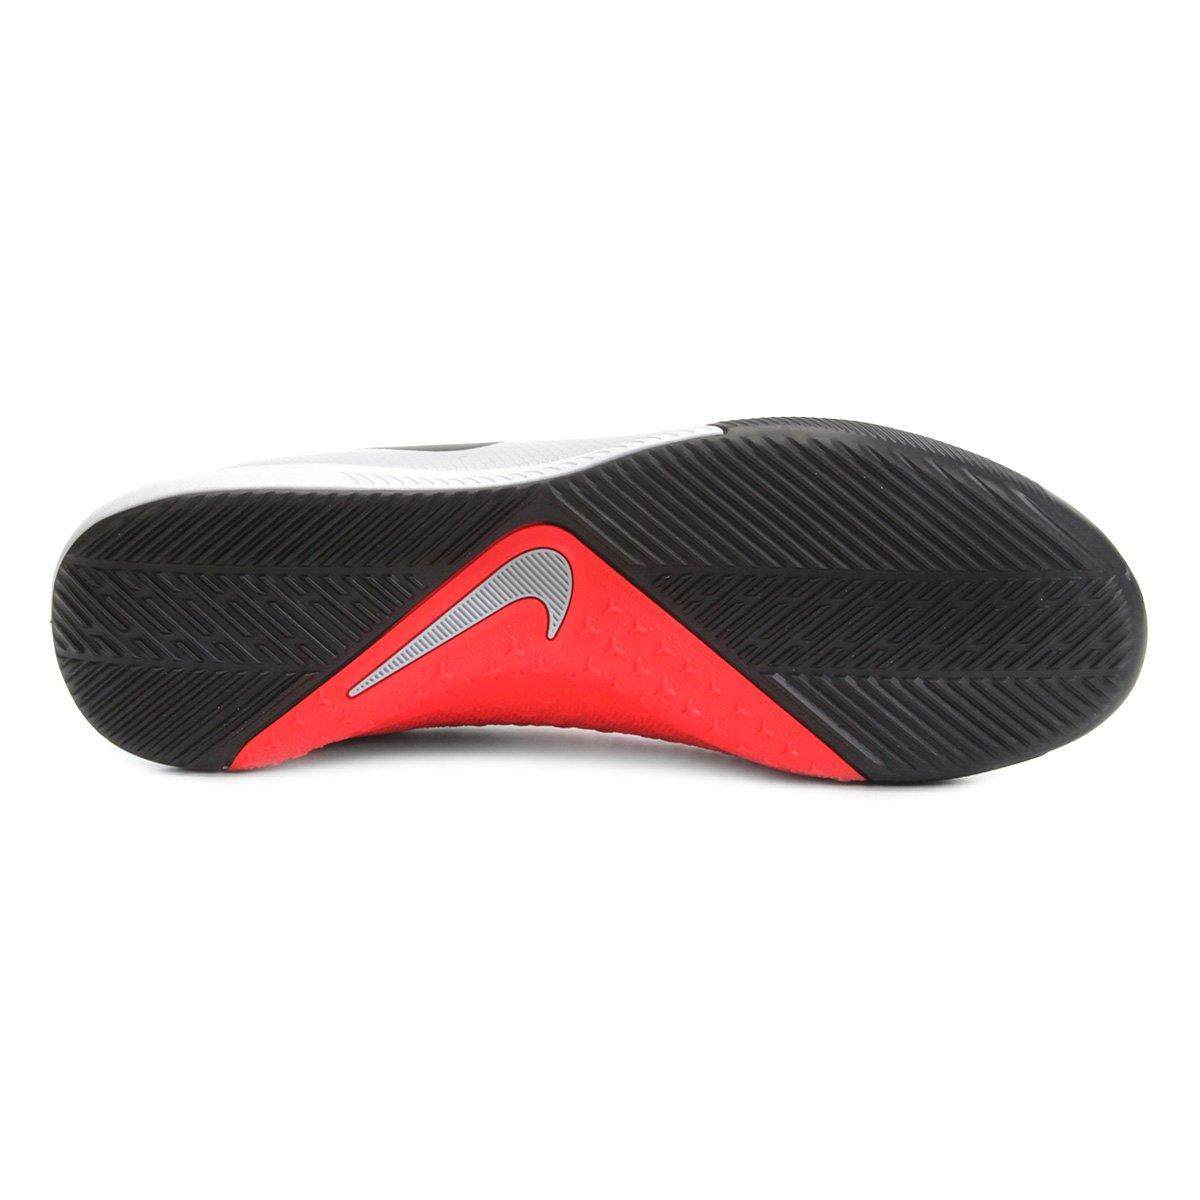 bd4b08c885 Chuteira Futsal Nike Phantom Vision Academy DF IC - Cinza - Compre ...